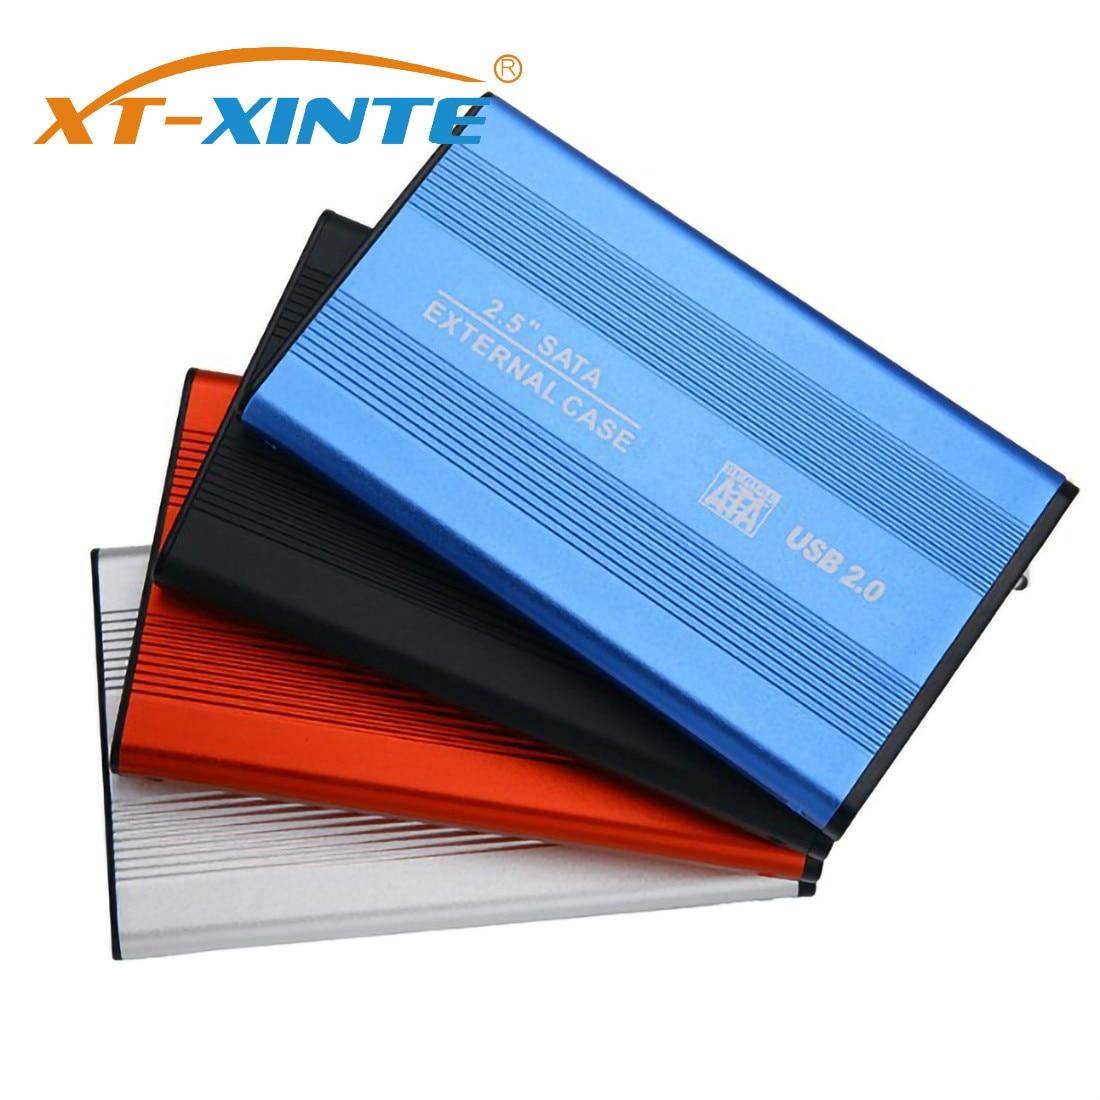 XT-XINTE Aluminium HDD Case 2.5 Inch External Enclosure Case Mobile HDD Enclosure Case USB 2.0 To SATA External Hard Drive Box